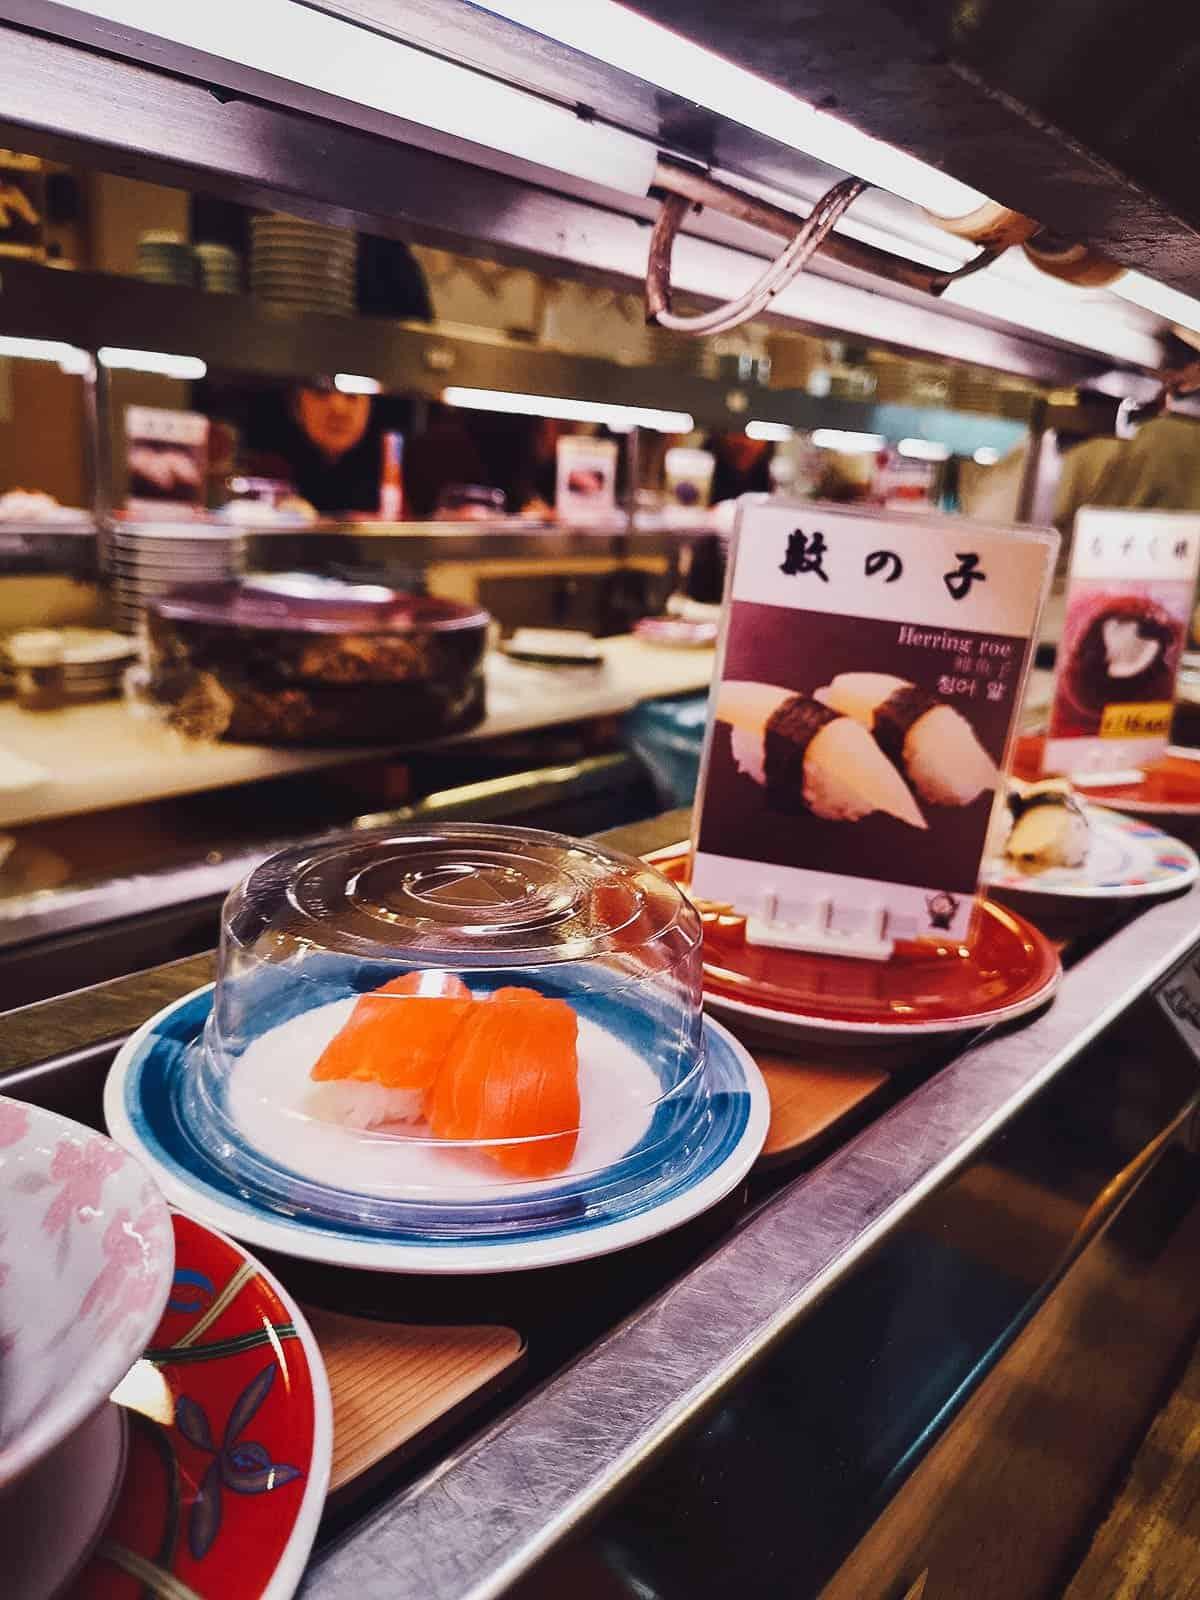 Sushi going around the conveyor belt